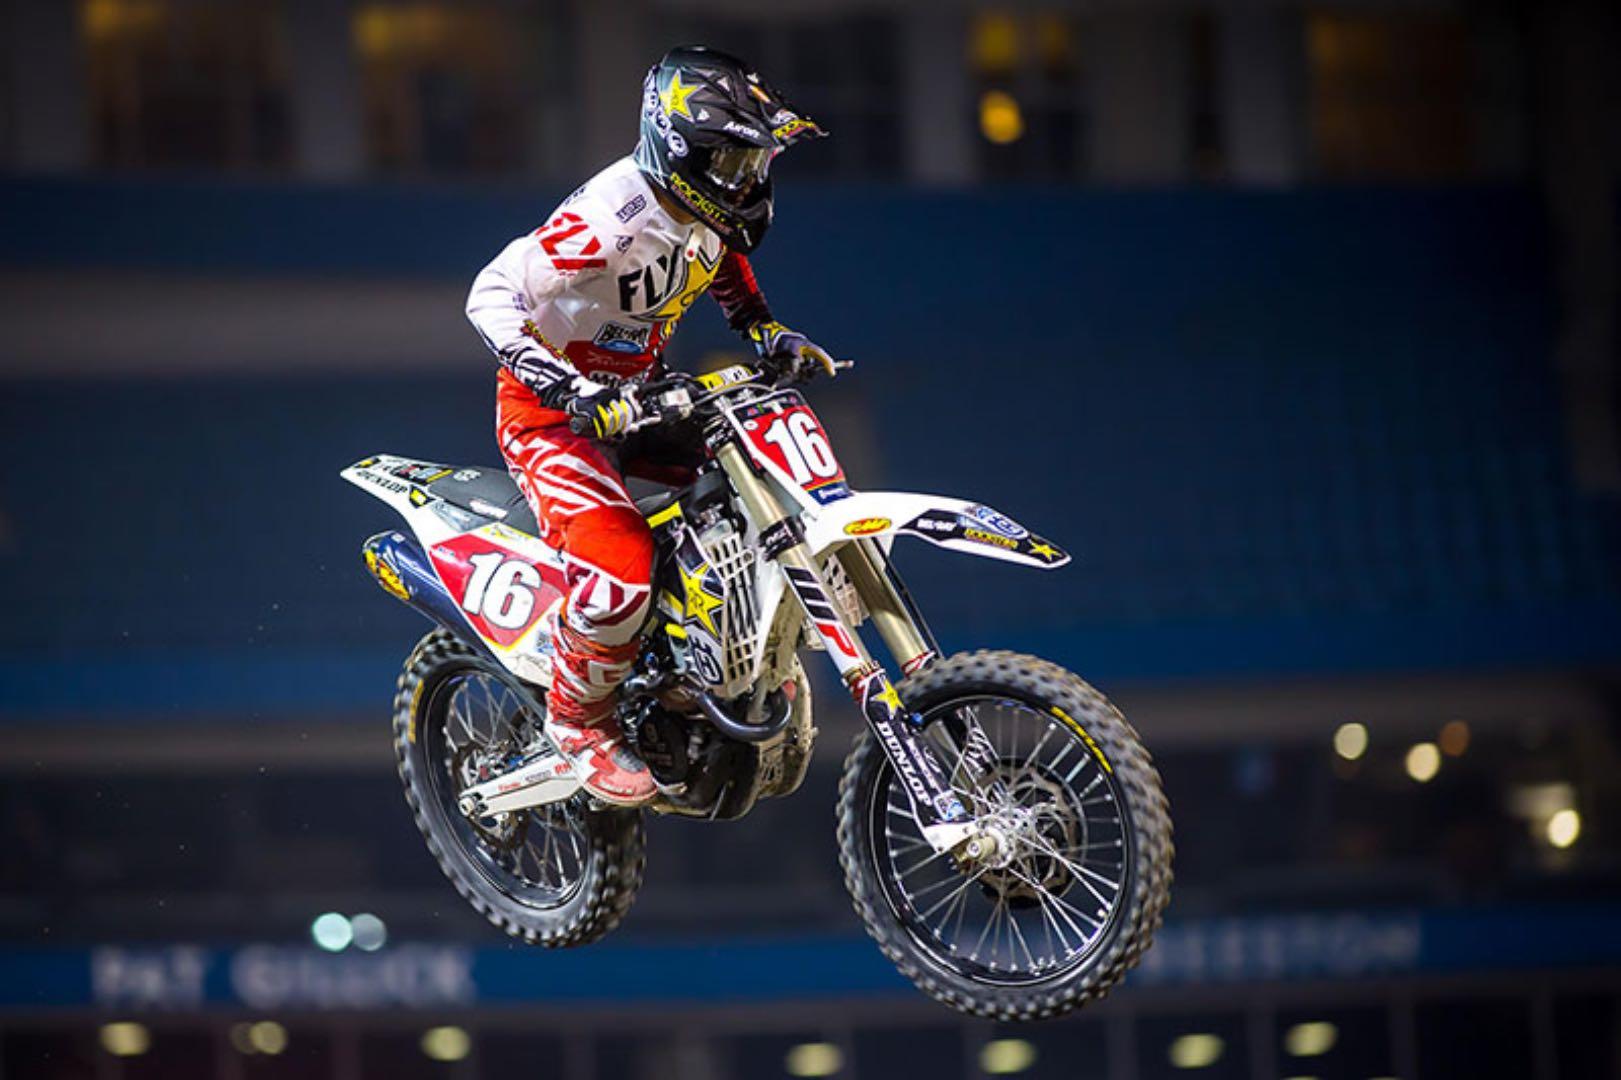 2017 St. Louis Supercross Preview: Husqvarna's Zach Osborne